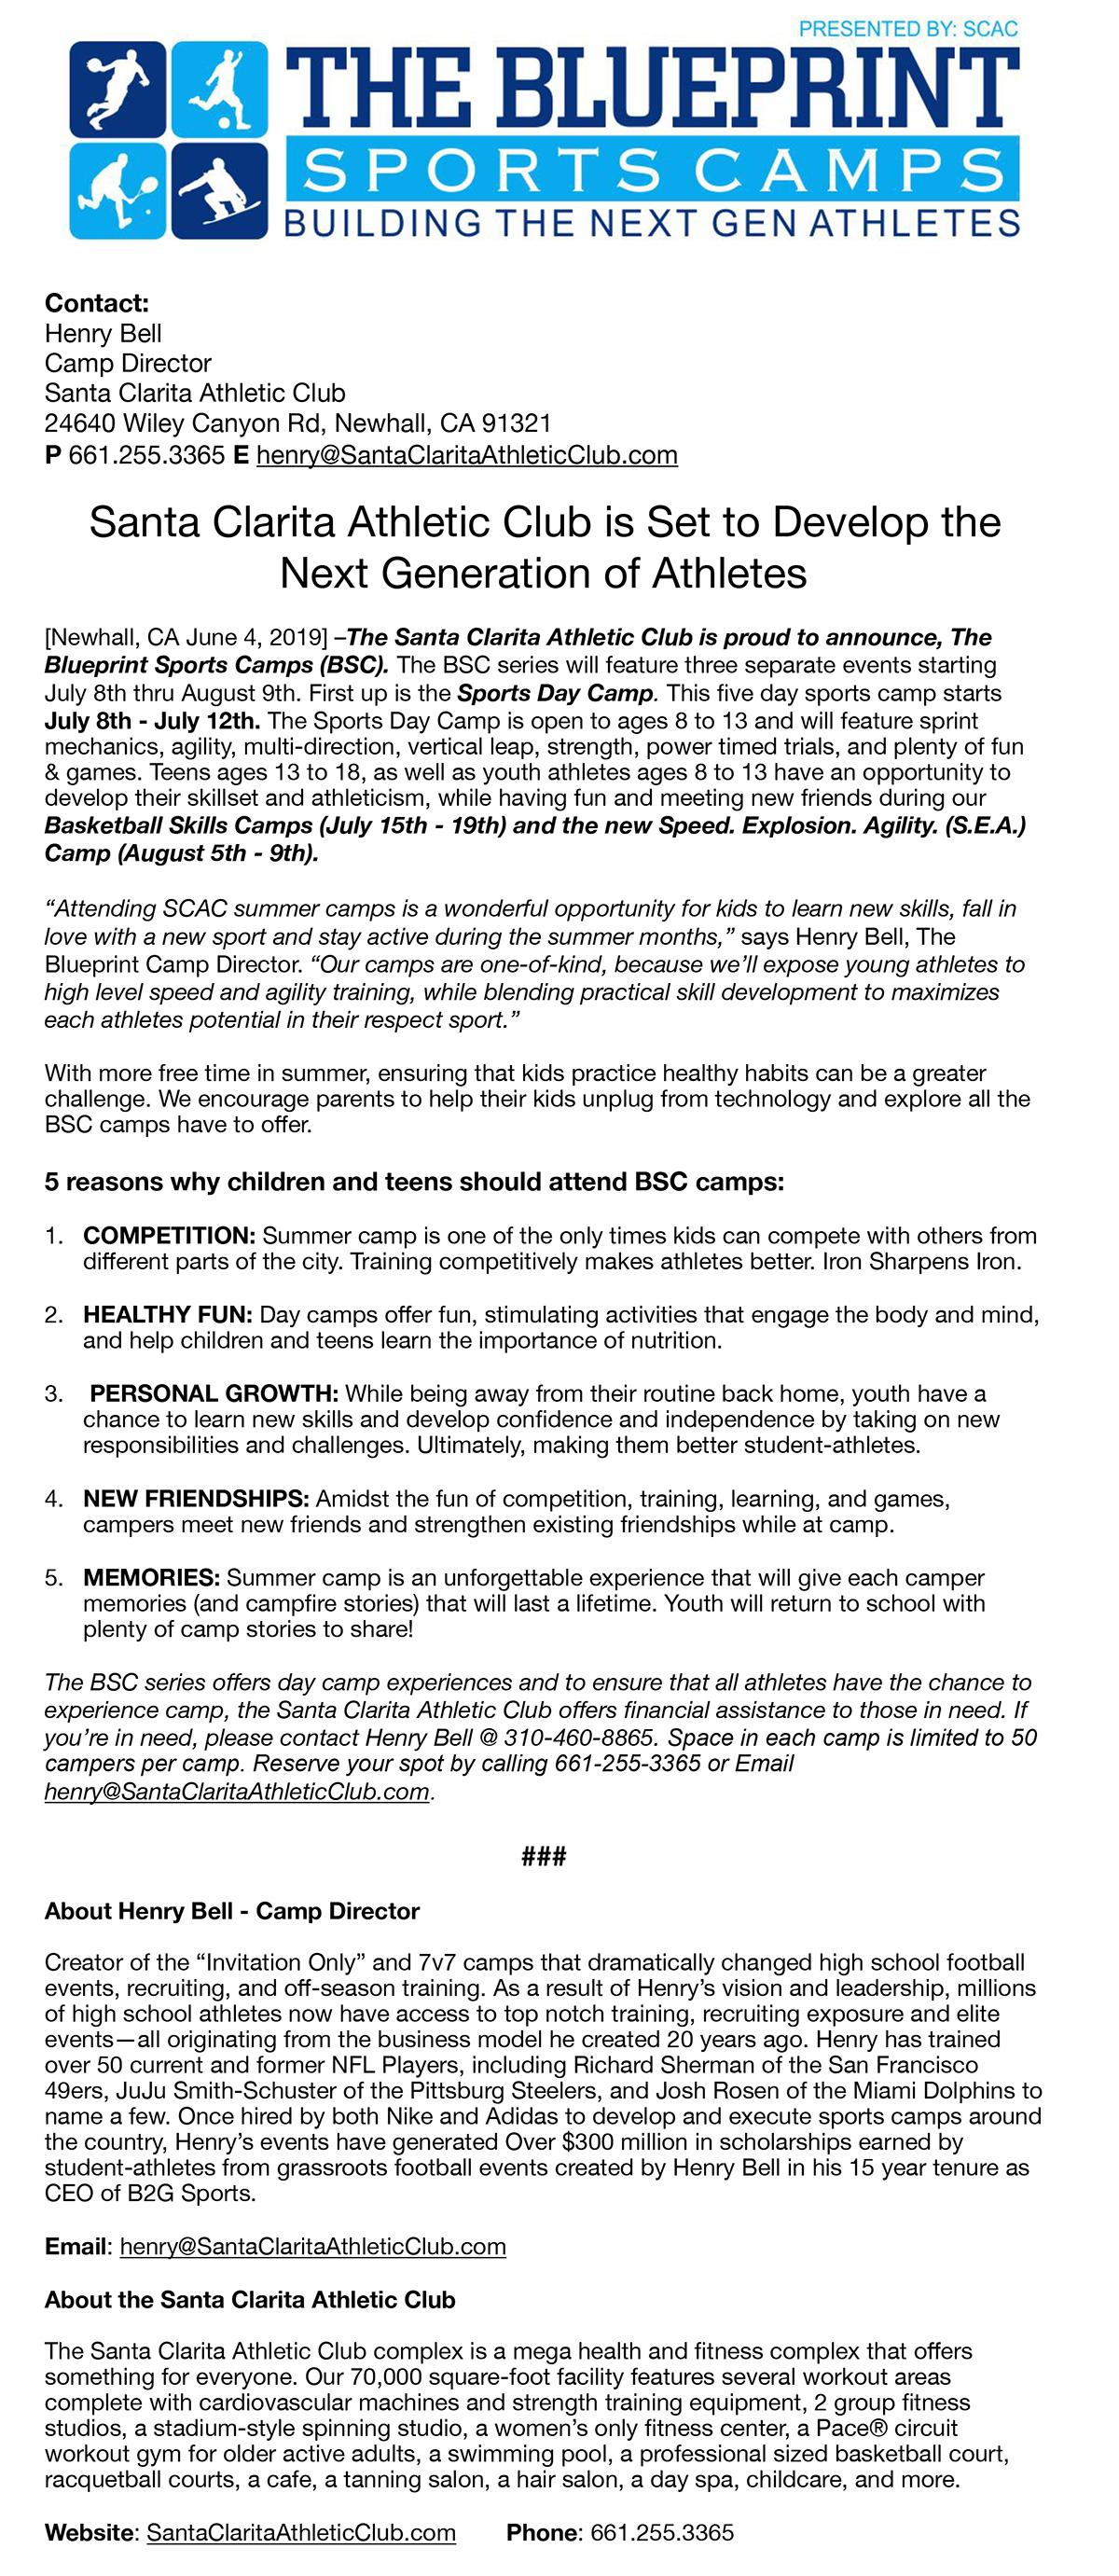 Blueprint Sports Camps Press Release